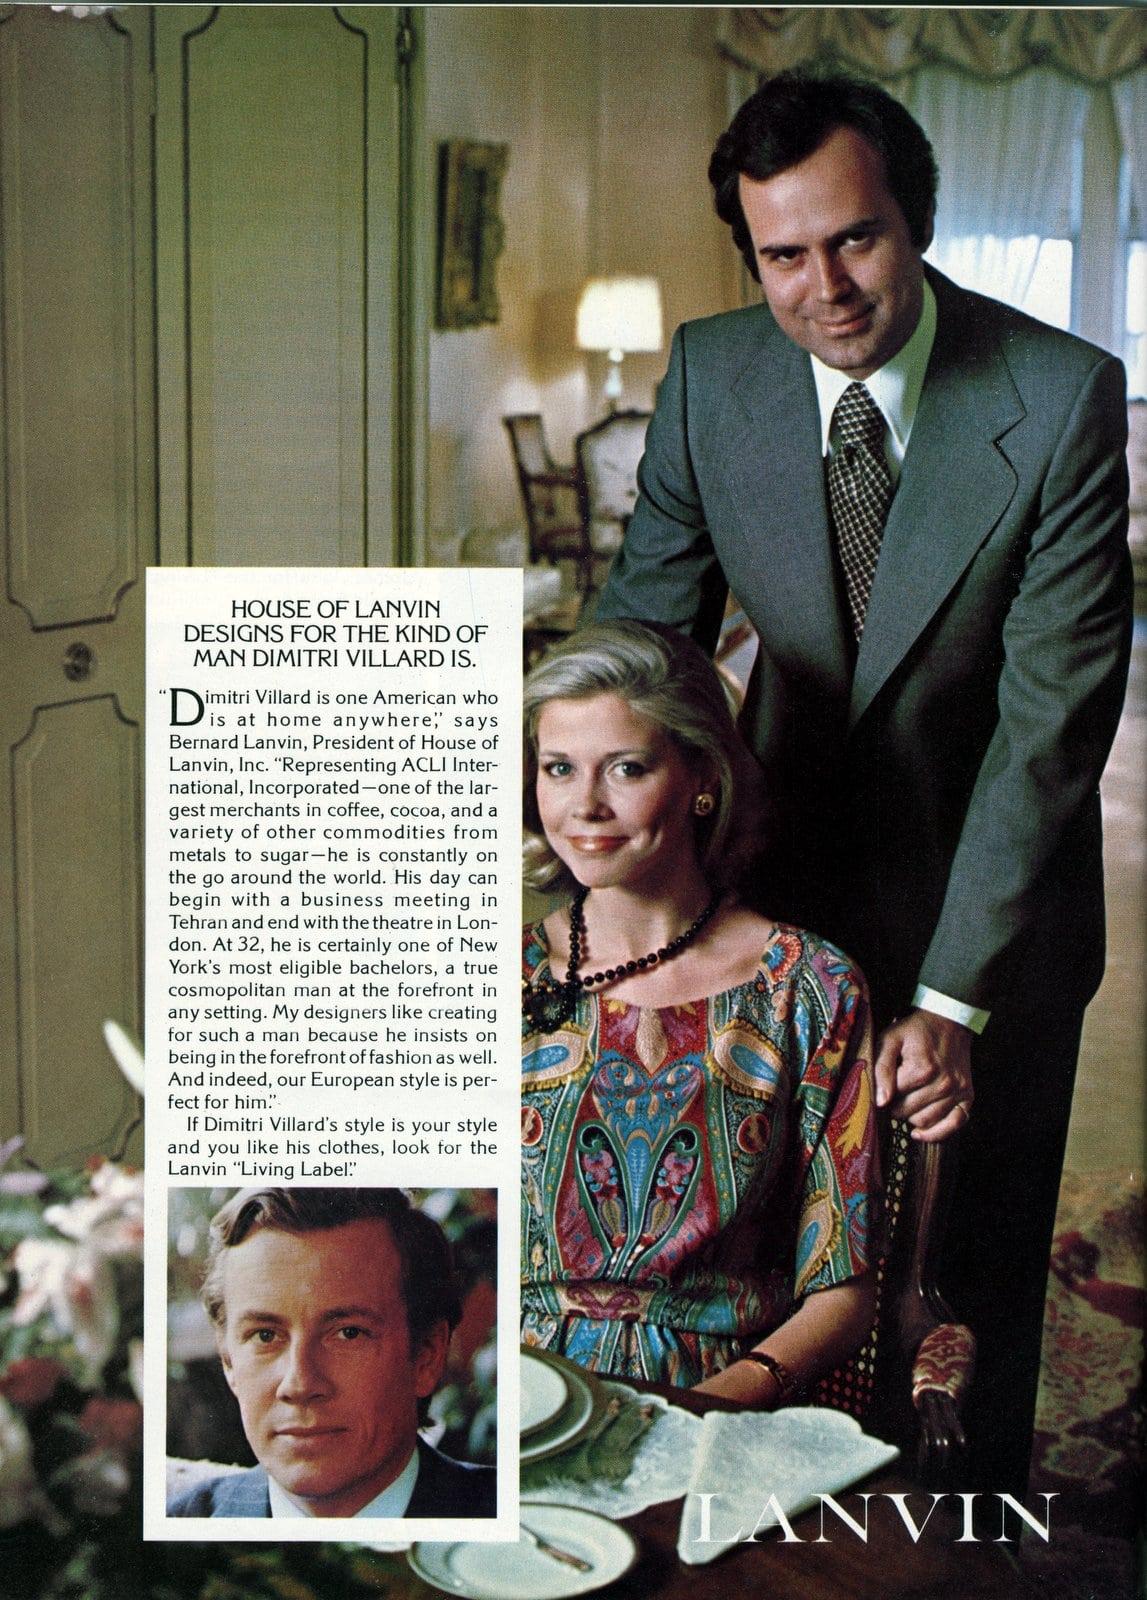 Designer suits for men from 1976 - House of Lanvin - Dimitri Villard